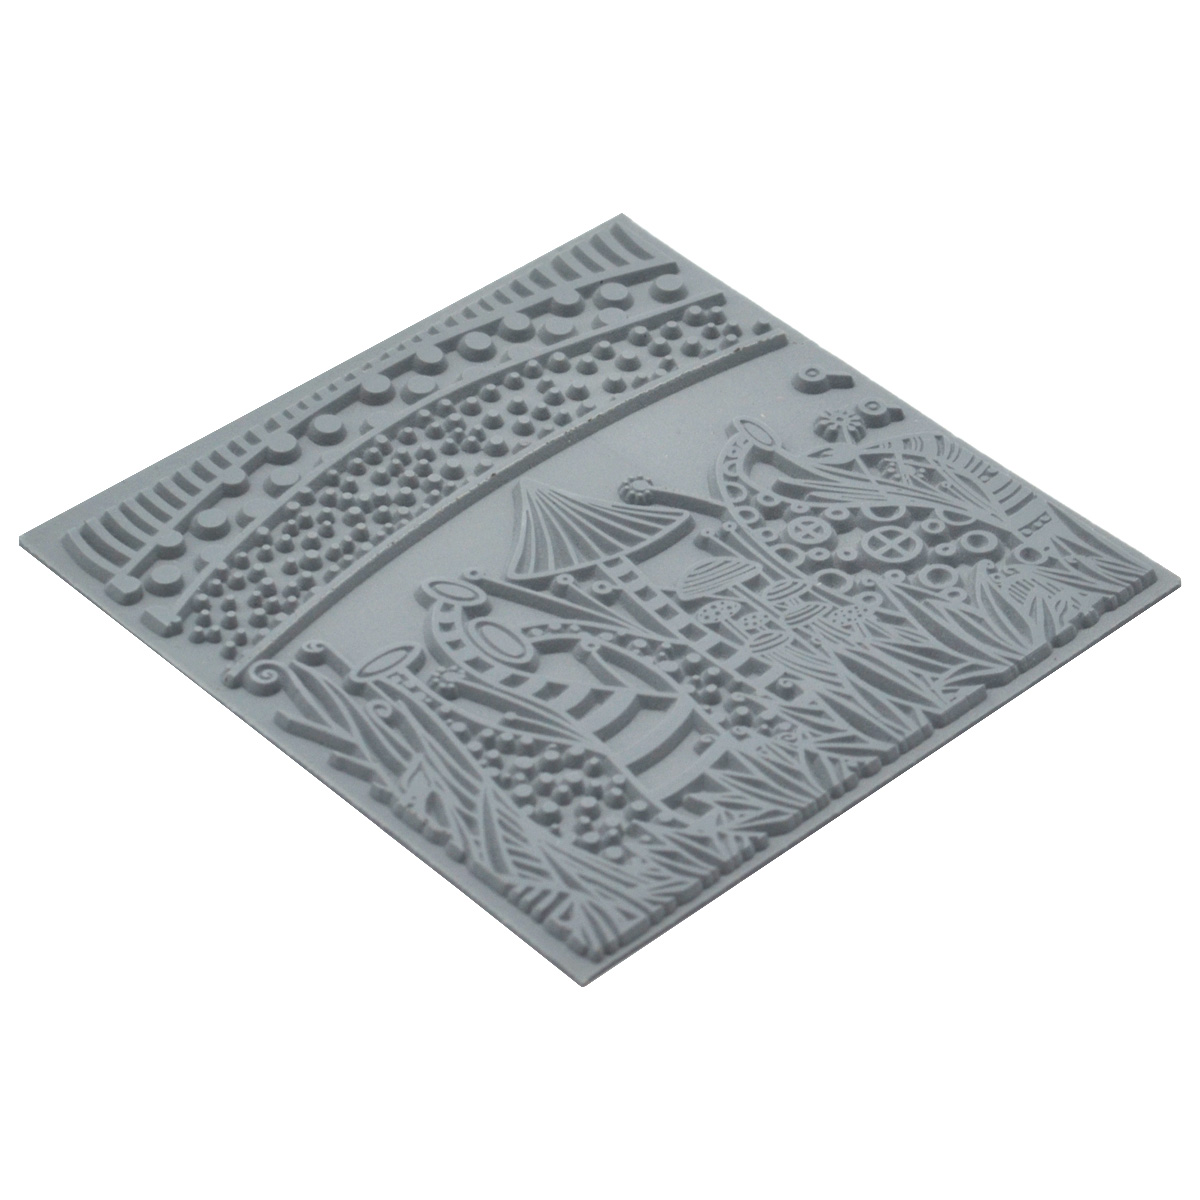 CE95020 Текстура для пластики резиновая 'Природа', 9х9 см. Cernit